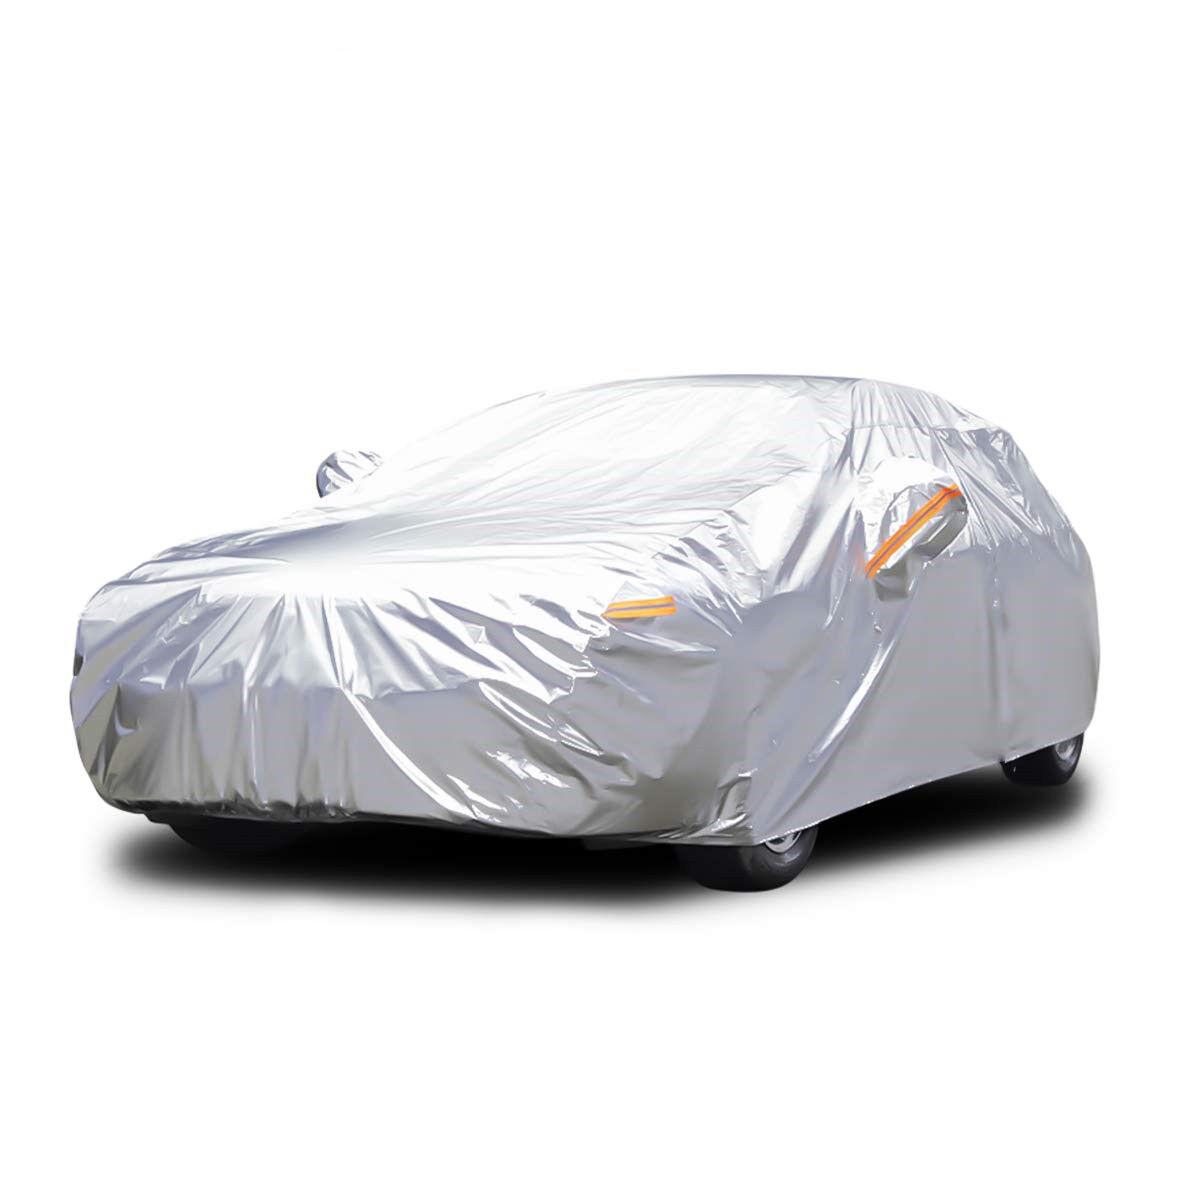 "Audew 6 Layer Premium anti-UV Car Cover For Sedan, Mid-Size SUV Up To 190"""